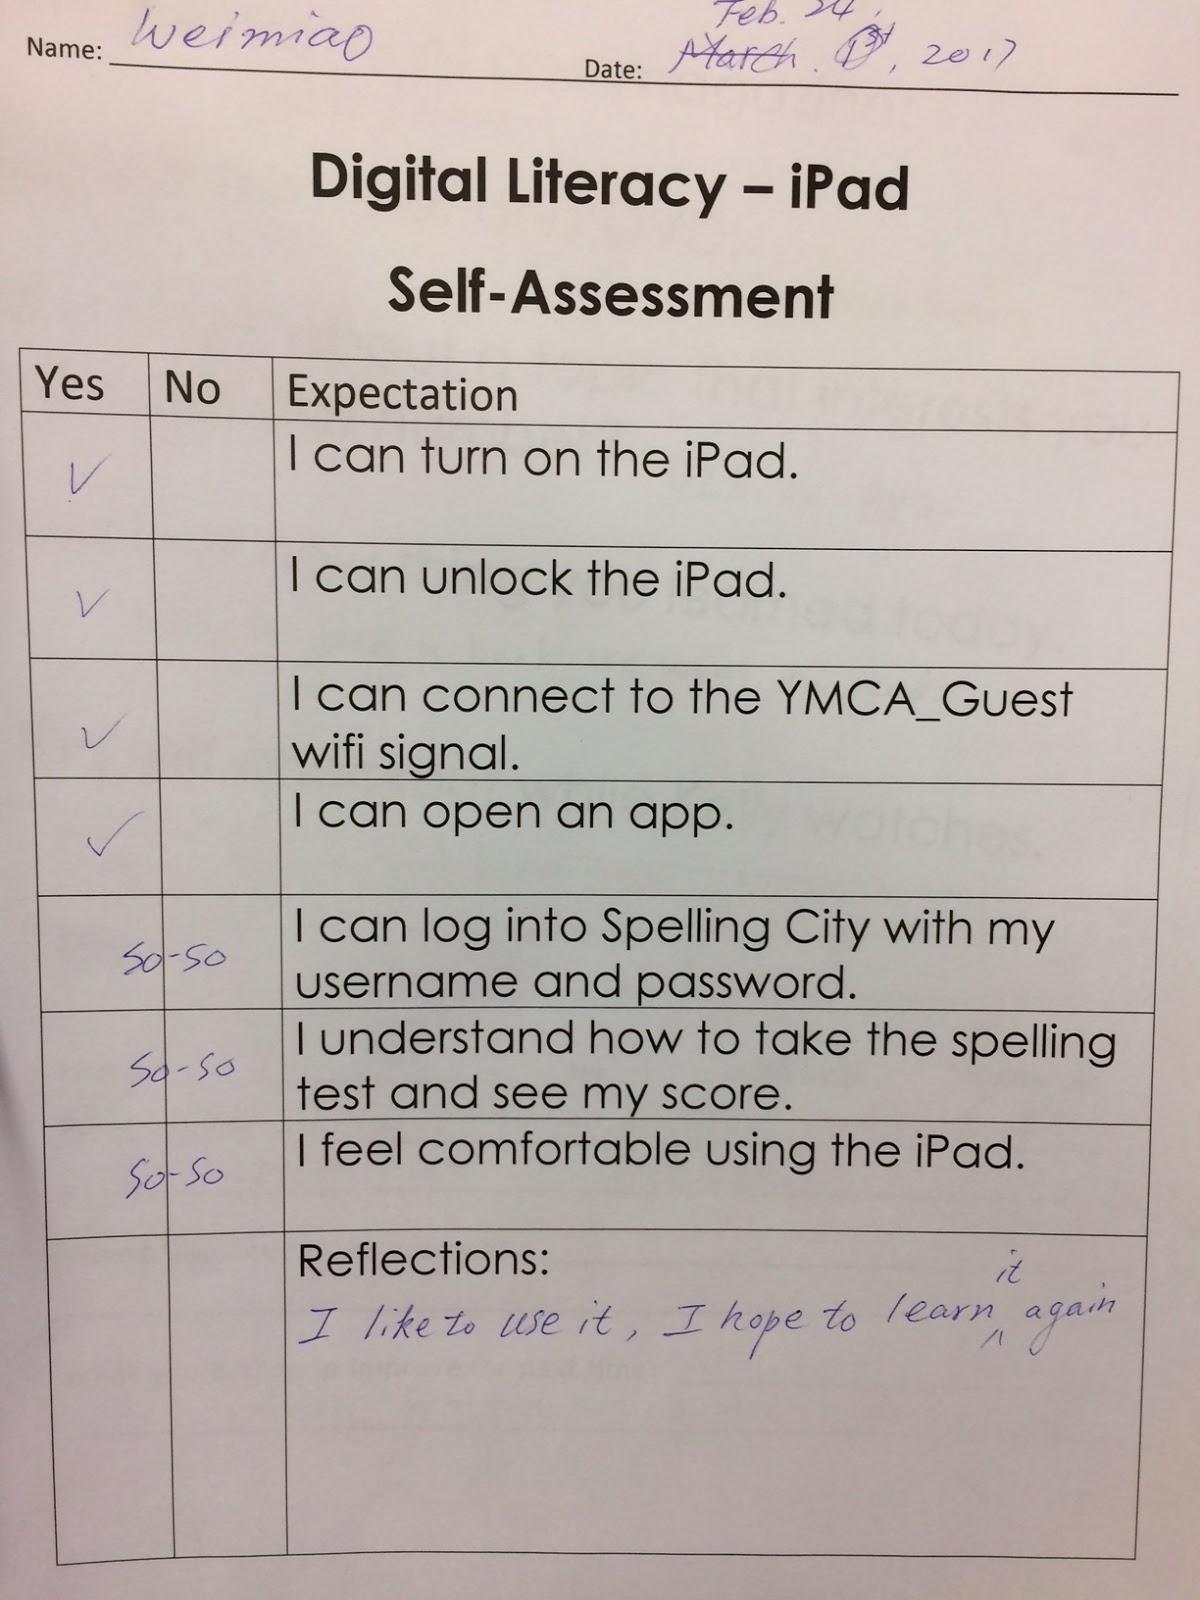 health needs assessment essay nursing needs assessment template training needs assessment where uqsys adtddns asia perfect resume example resume and cv letter health needs assessment